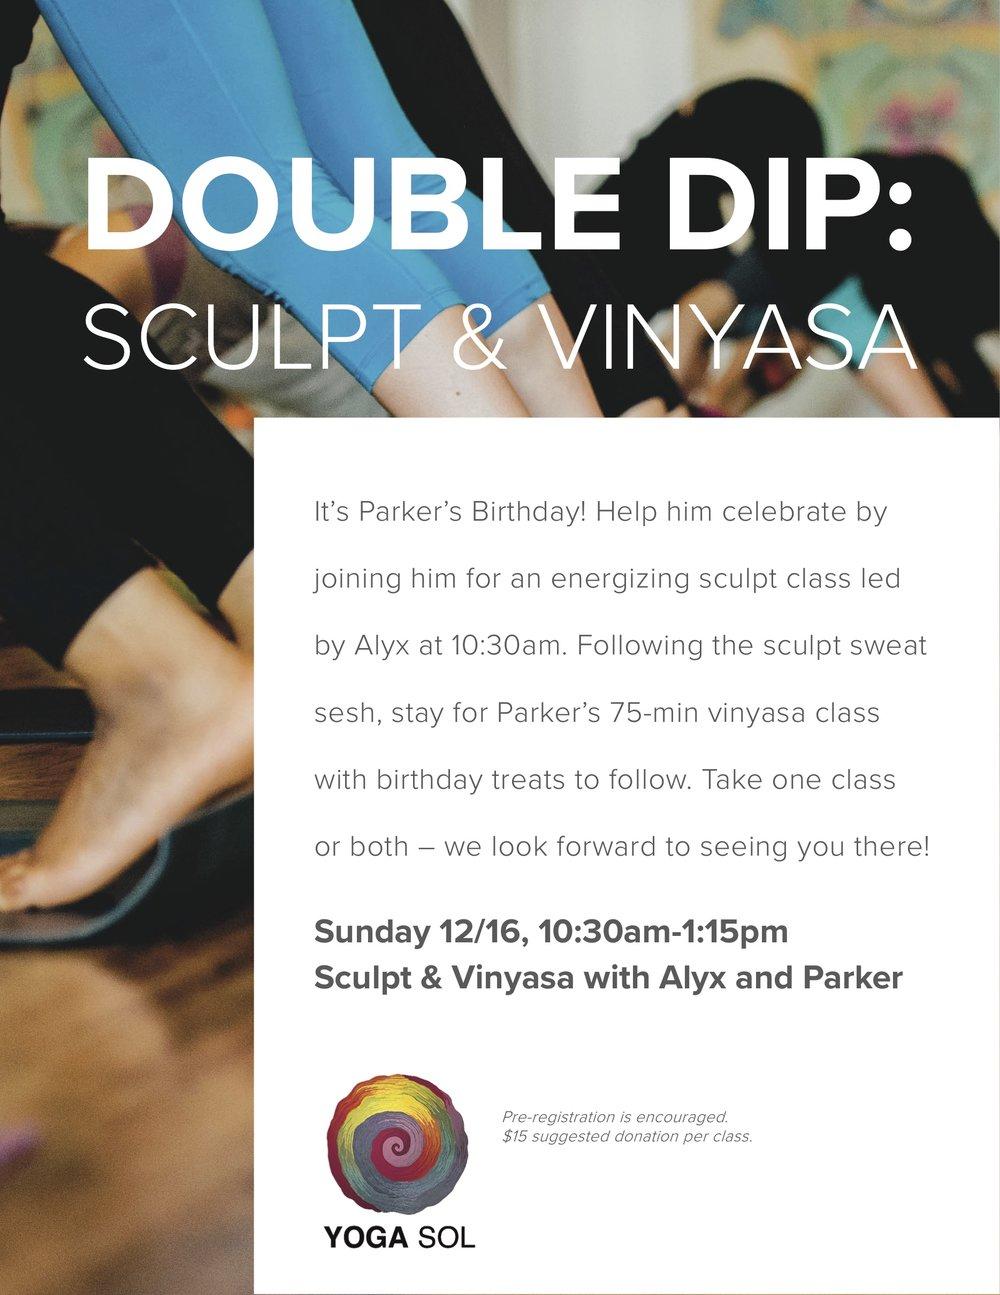 2018 12 16 double dip sculpt vinyasa.jpg